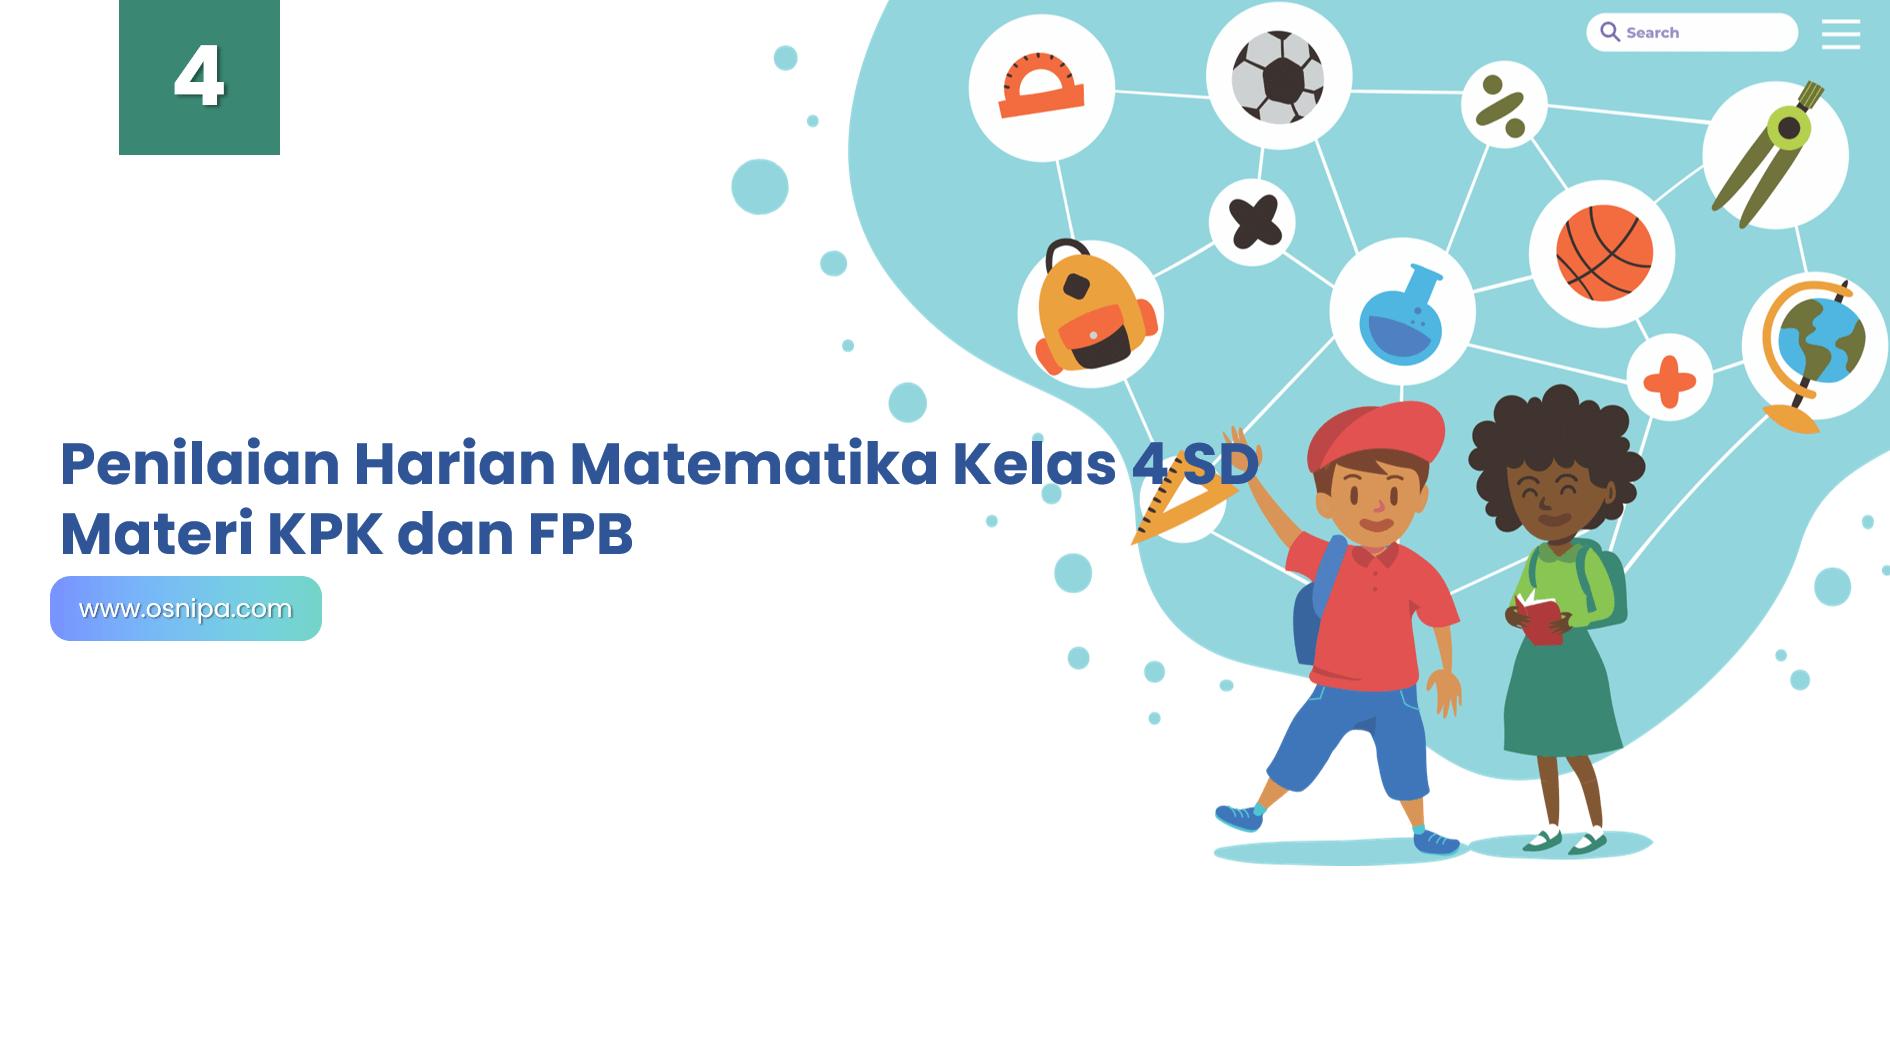 Penilaian Harian Matematika Kelas 4 SD Materi KPK dan FPB